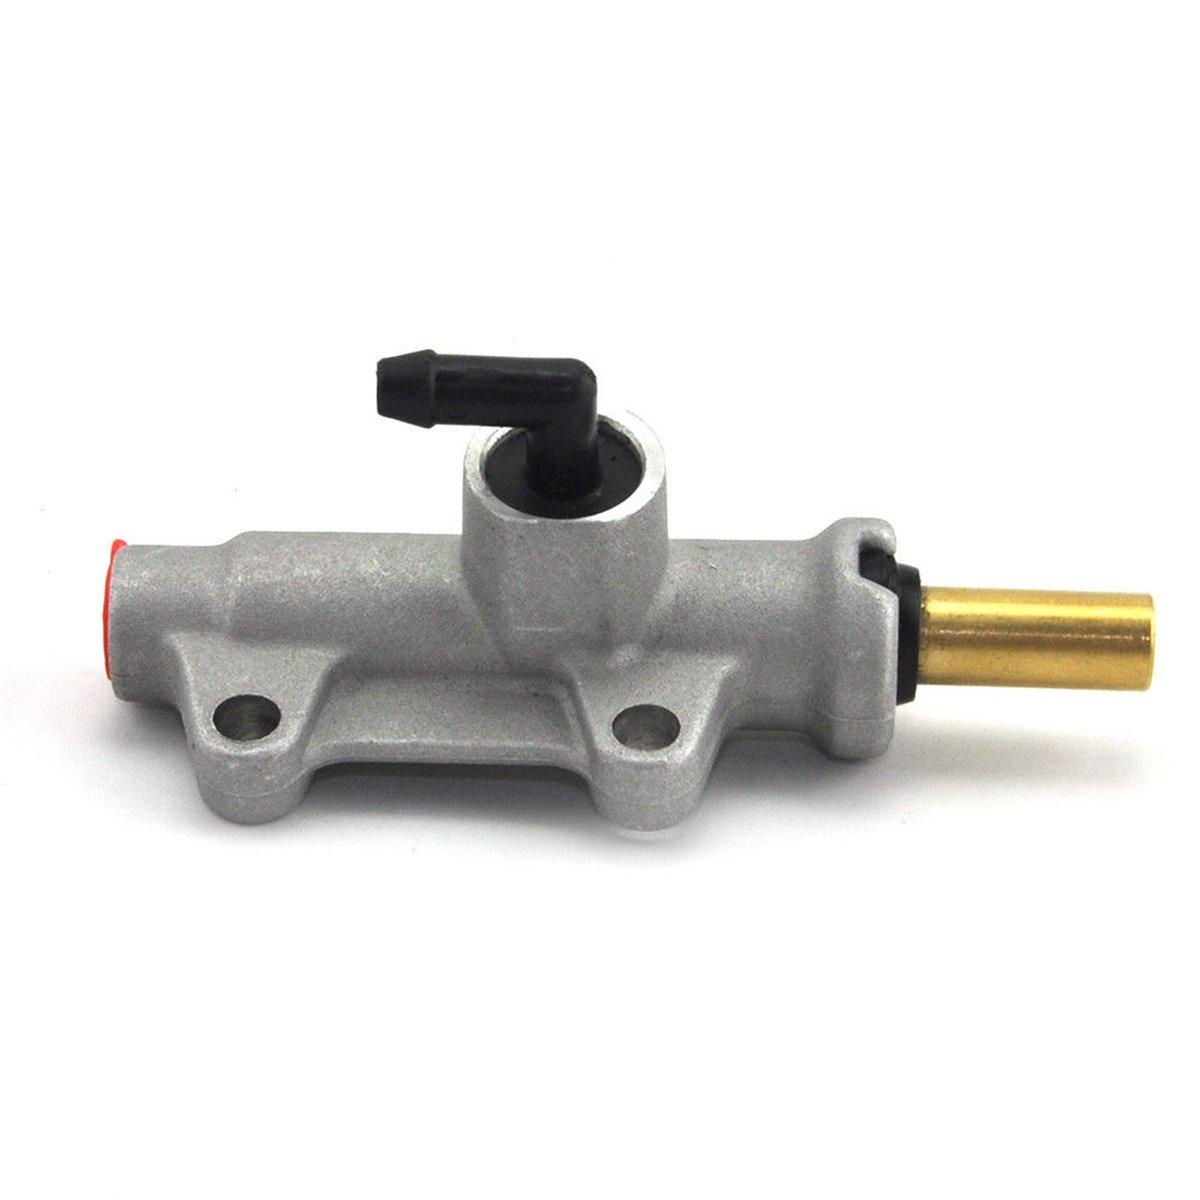 Rear Brake Master Cylinder for Polaris Sportsman 400/500/600/700 2003-2005 fits Replace Part NO.1911113/1910790/1910301 TENGSHENG